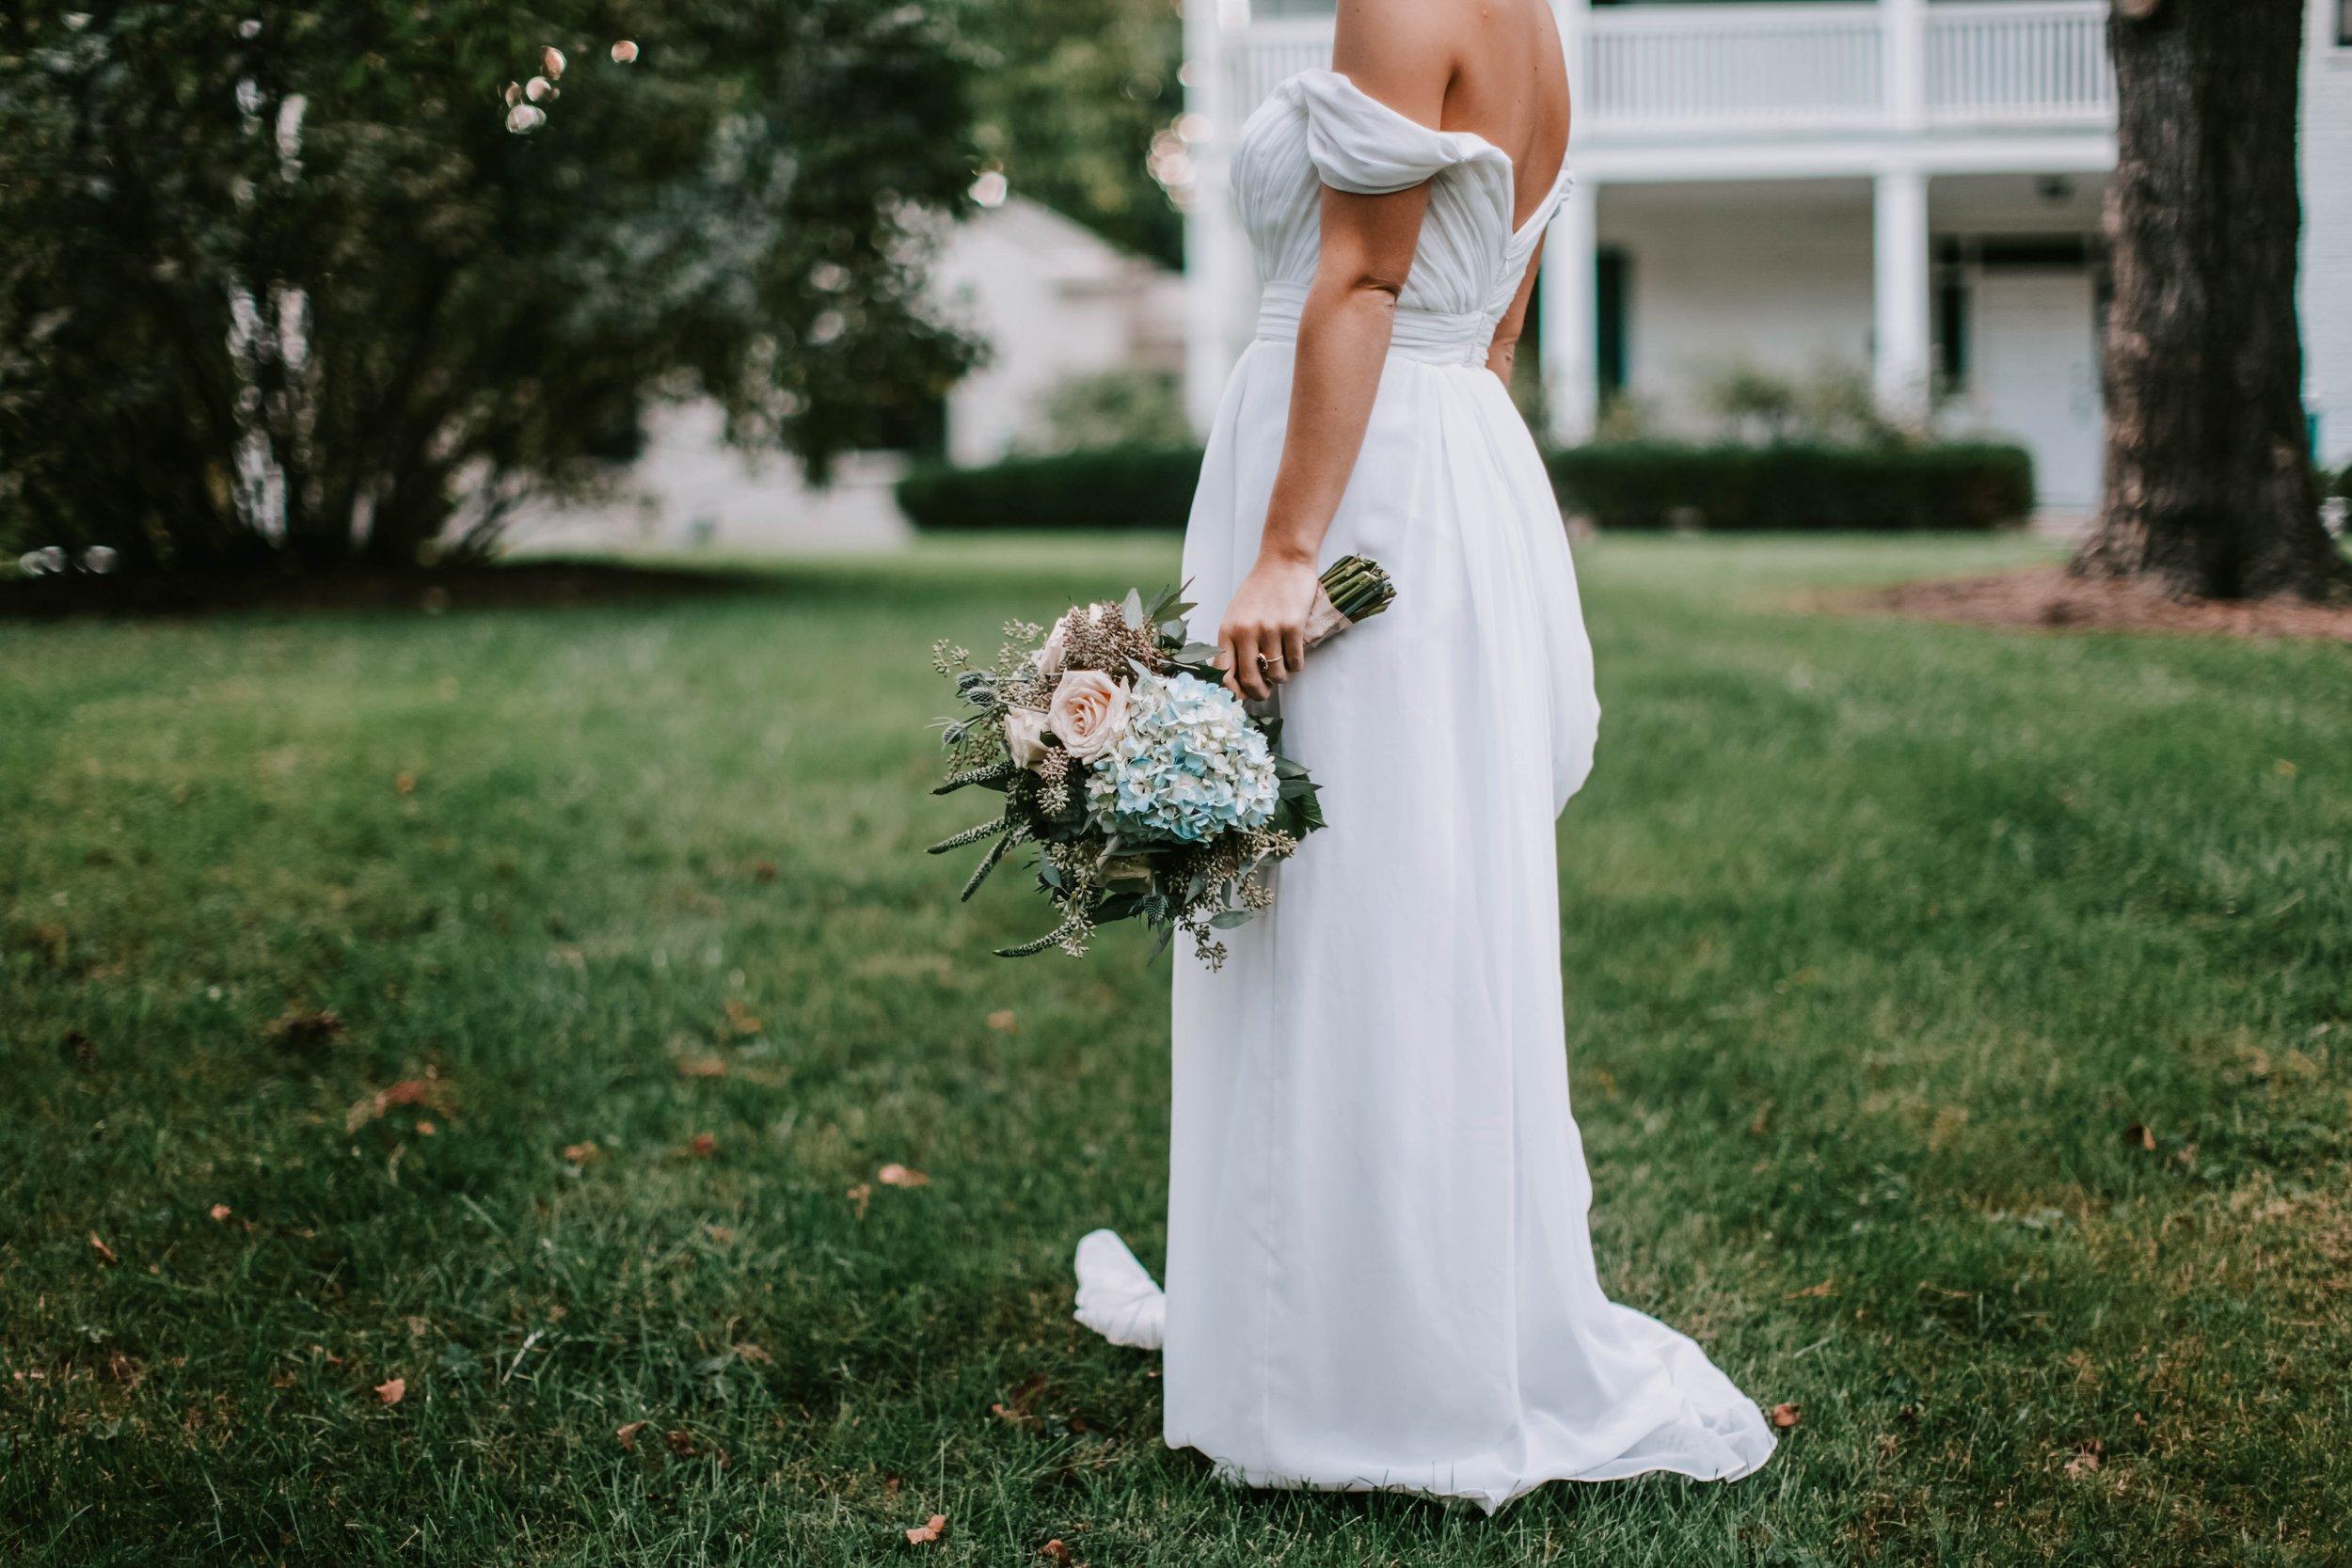 Professional Bridesmaid Tiffany Wright